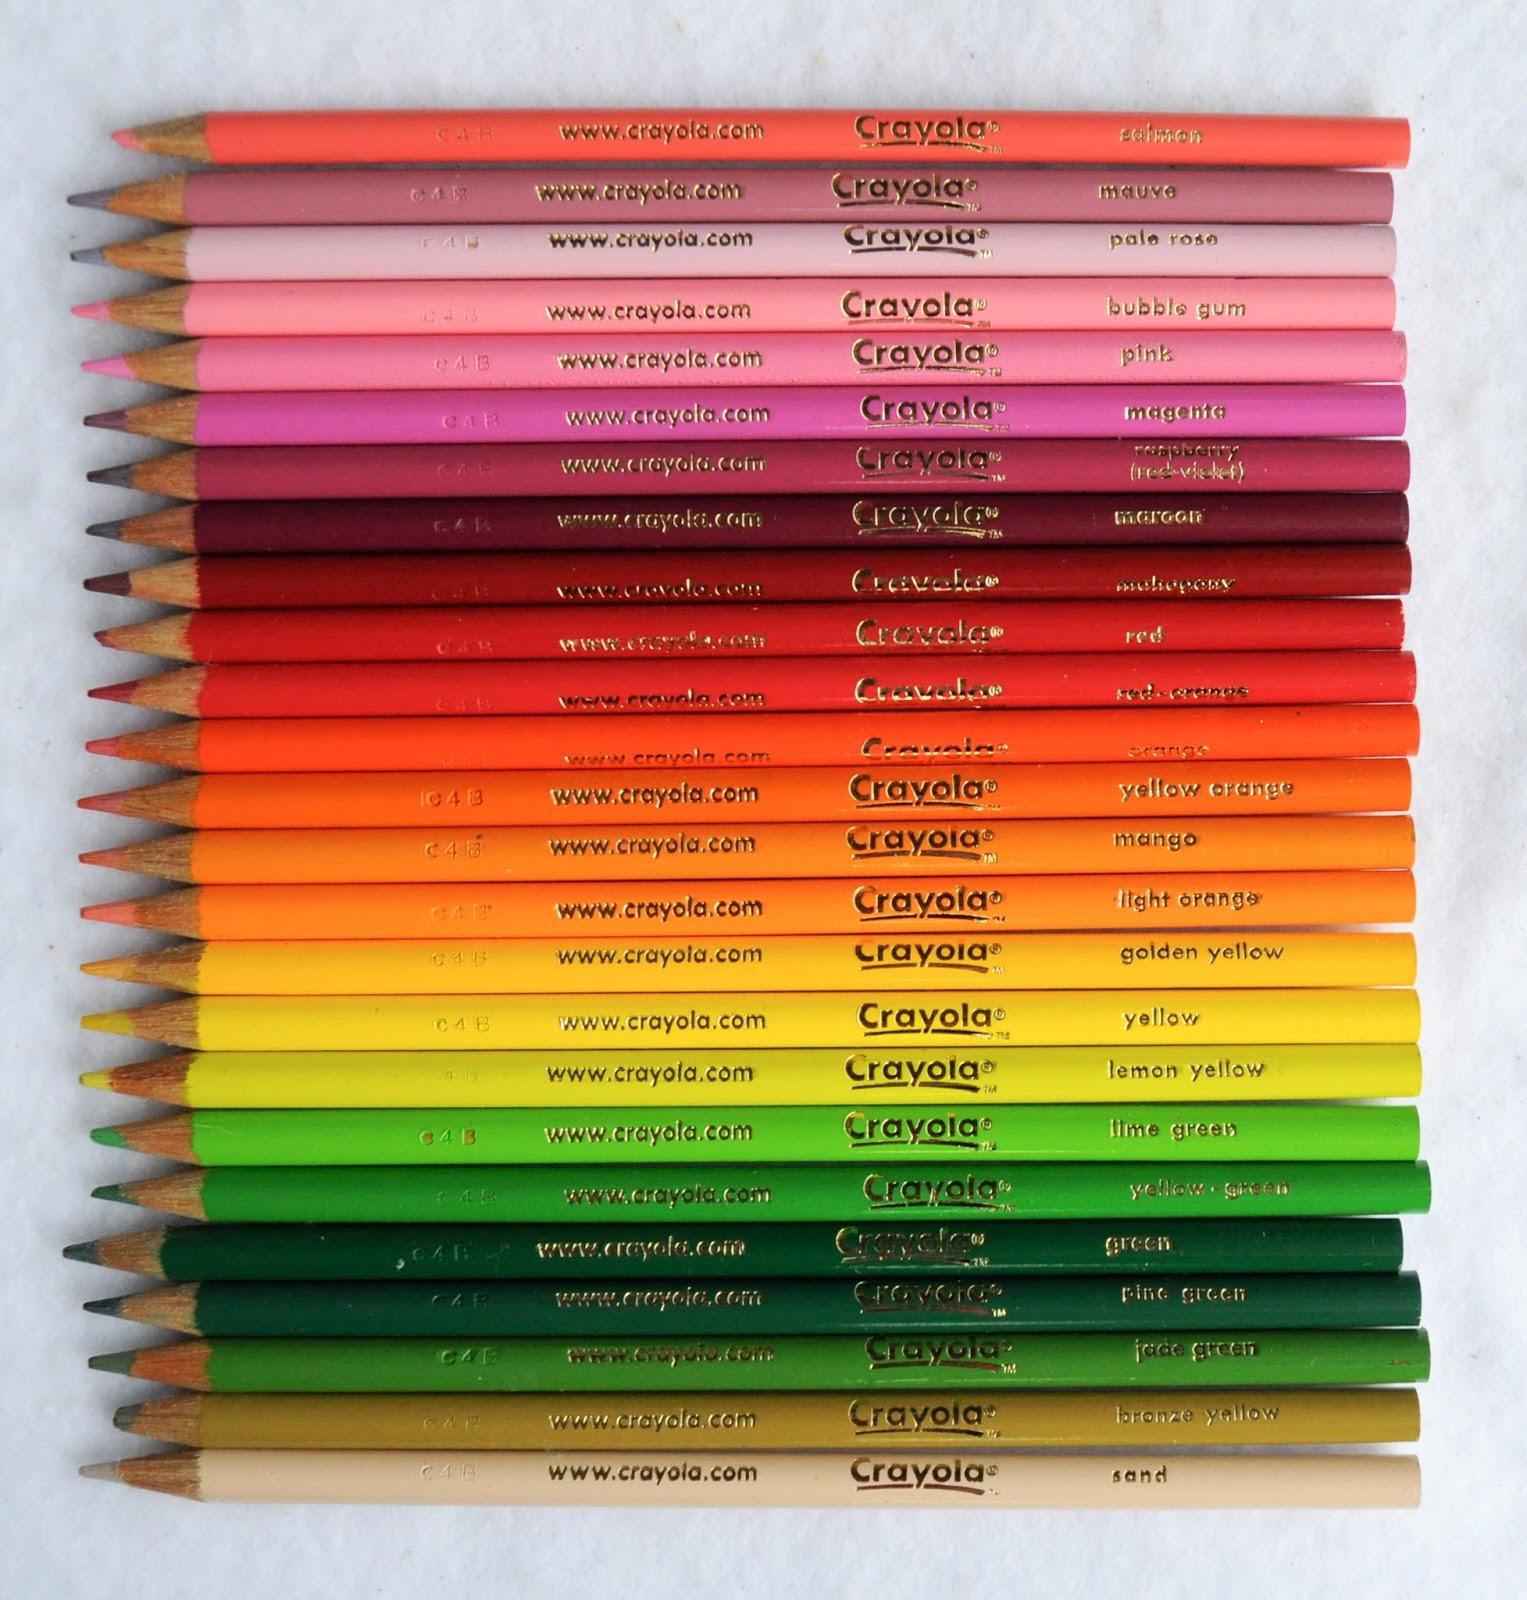 2002 50 colored pencils